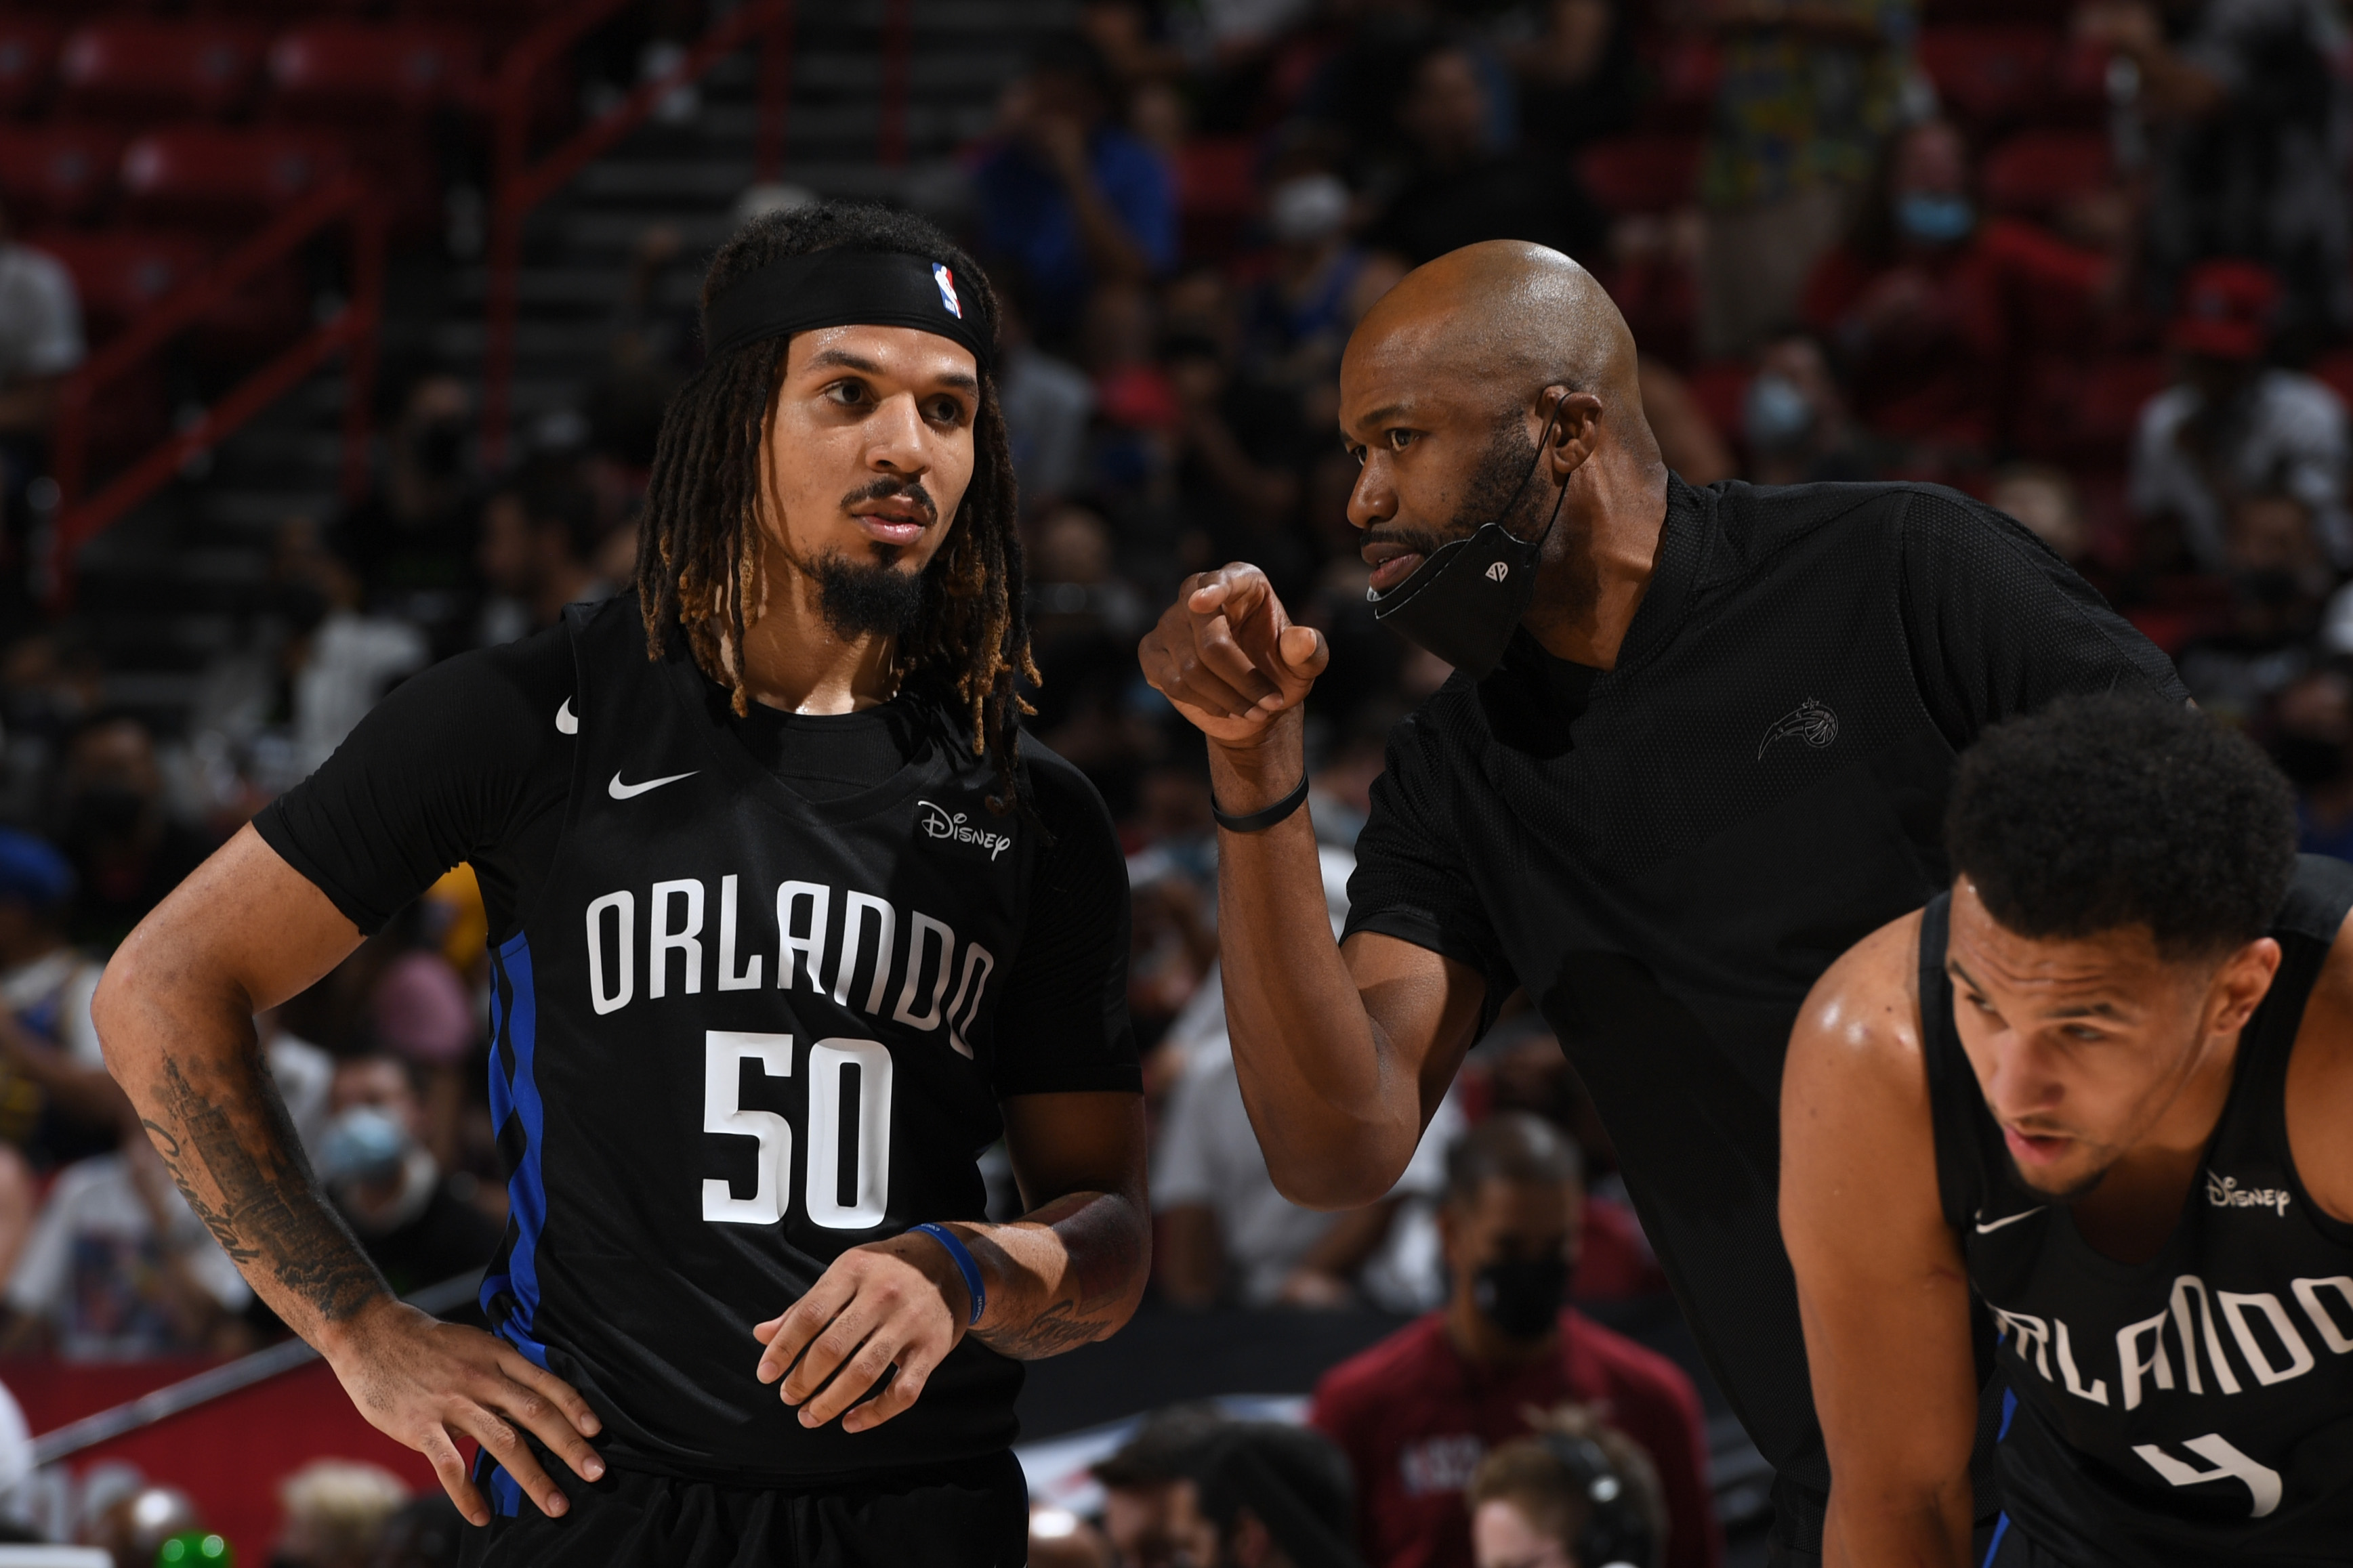 2021 Las Vegas Summer League - Orlando Magic v Golden State Warriors